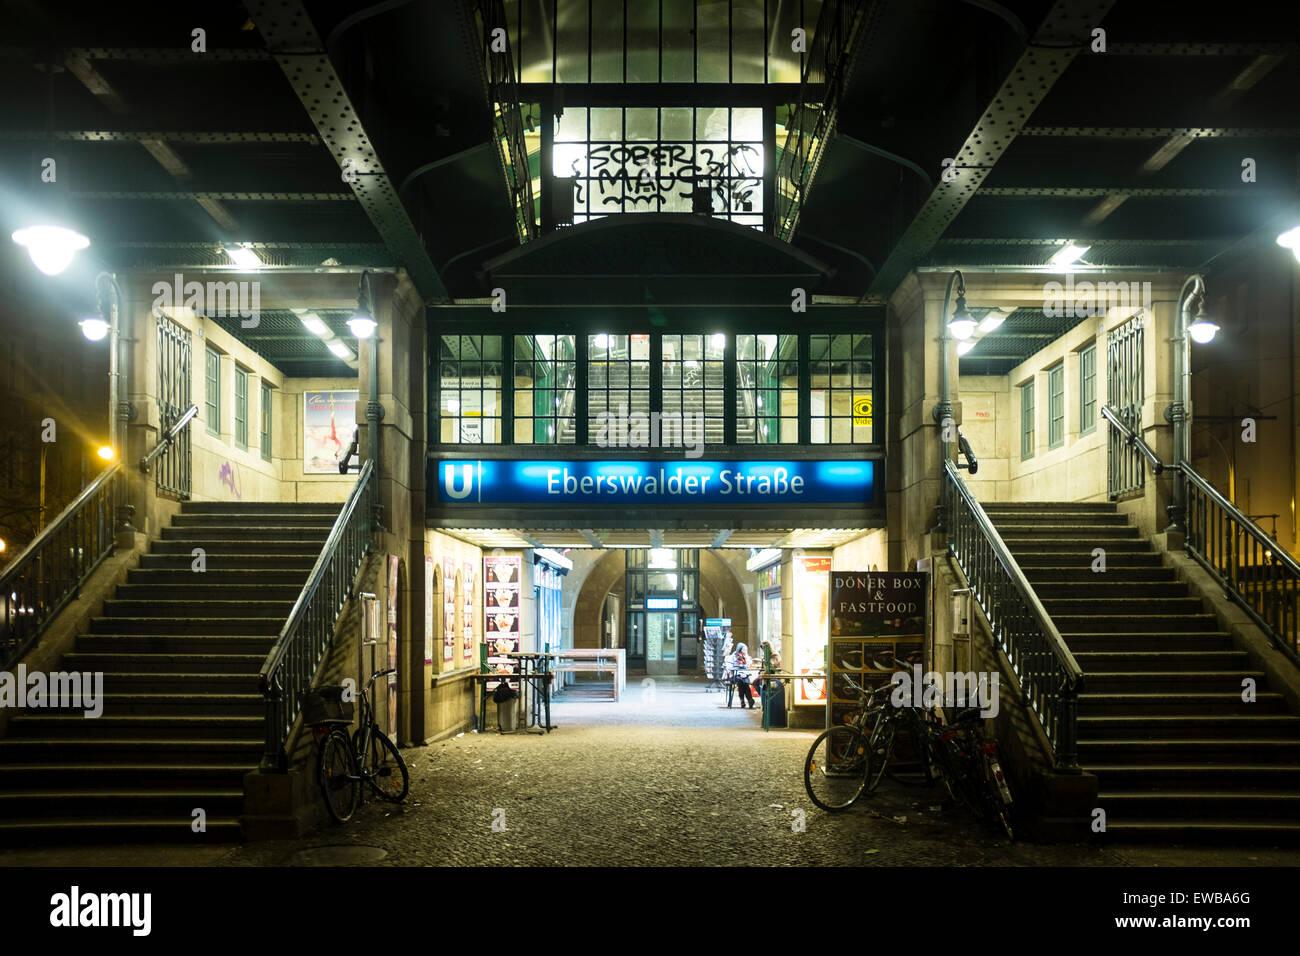 Subway train station Eberswalder Strasse, Berlin, Germany - Stock Image